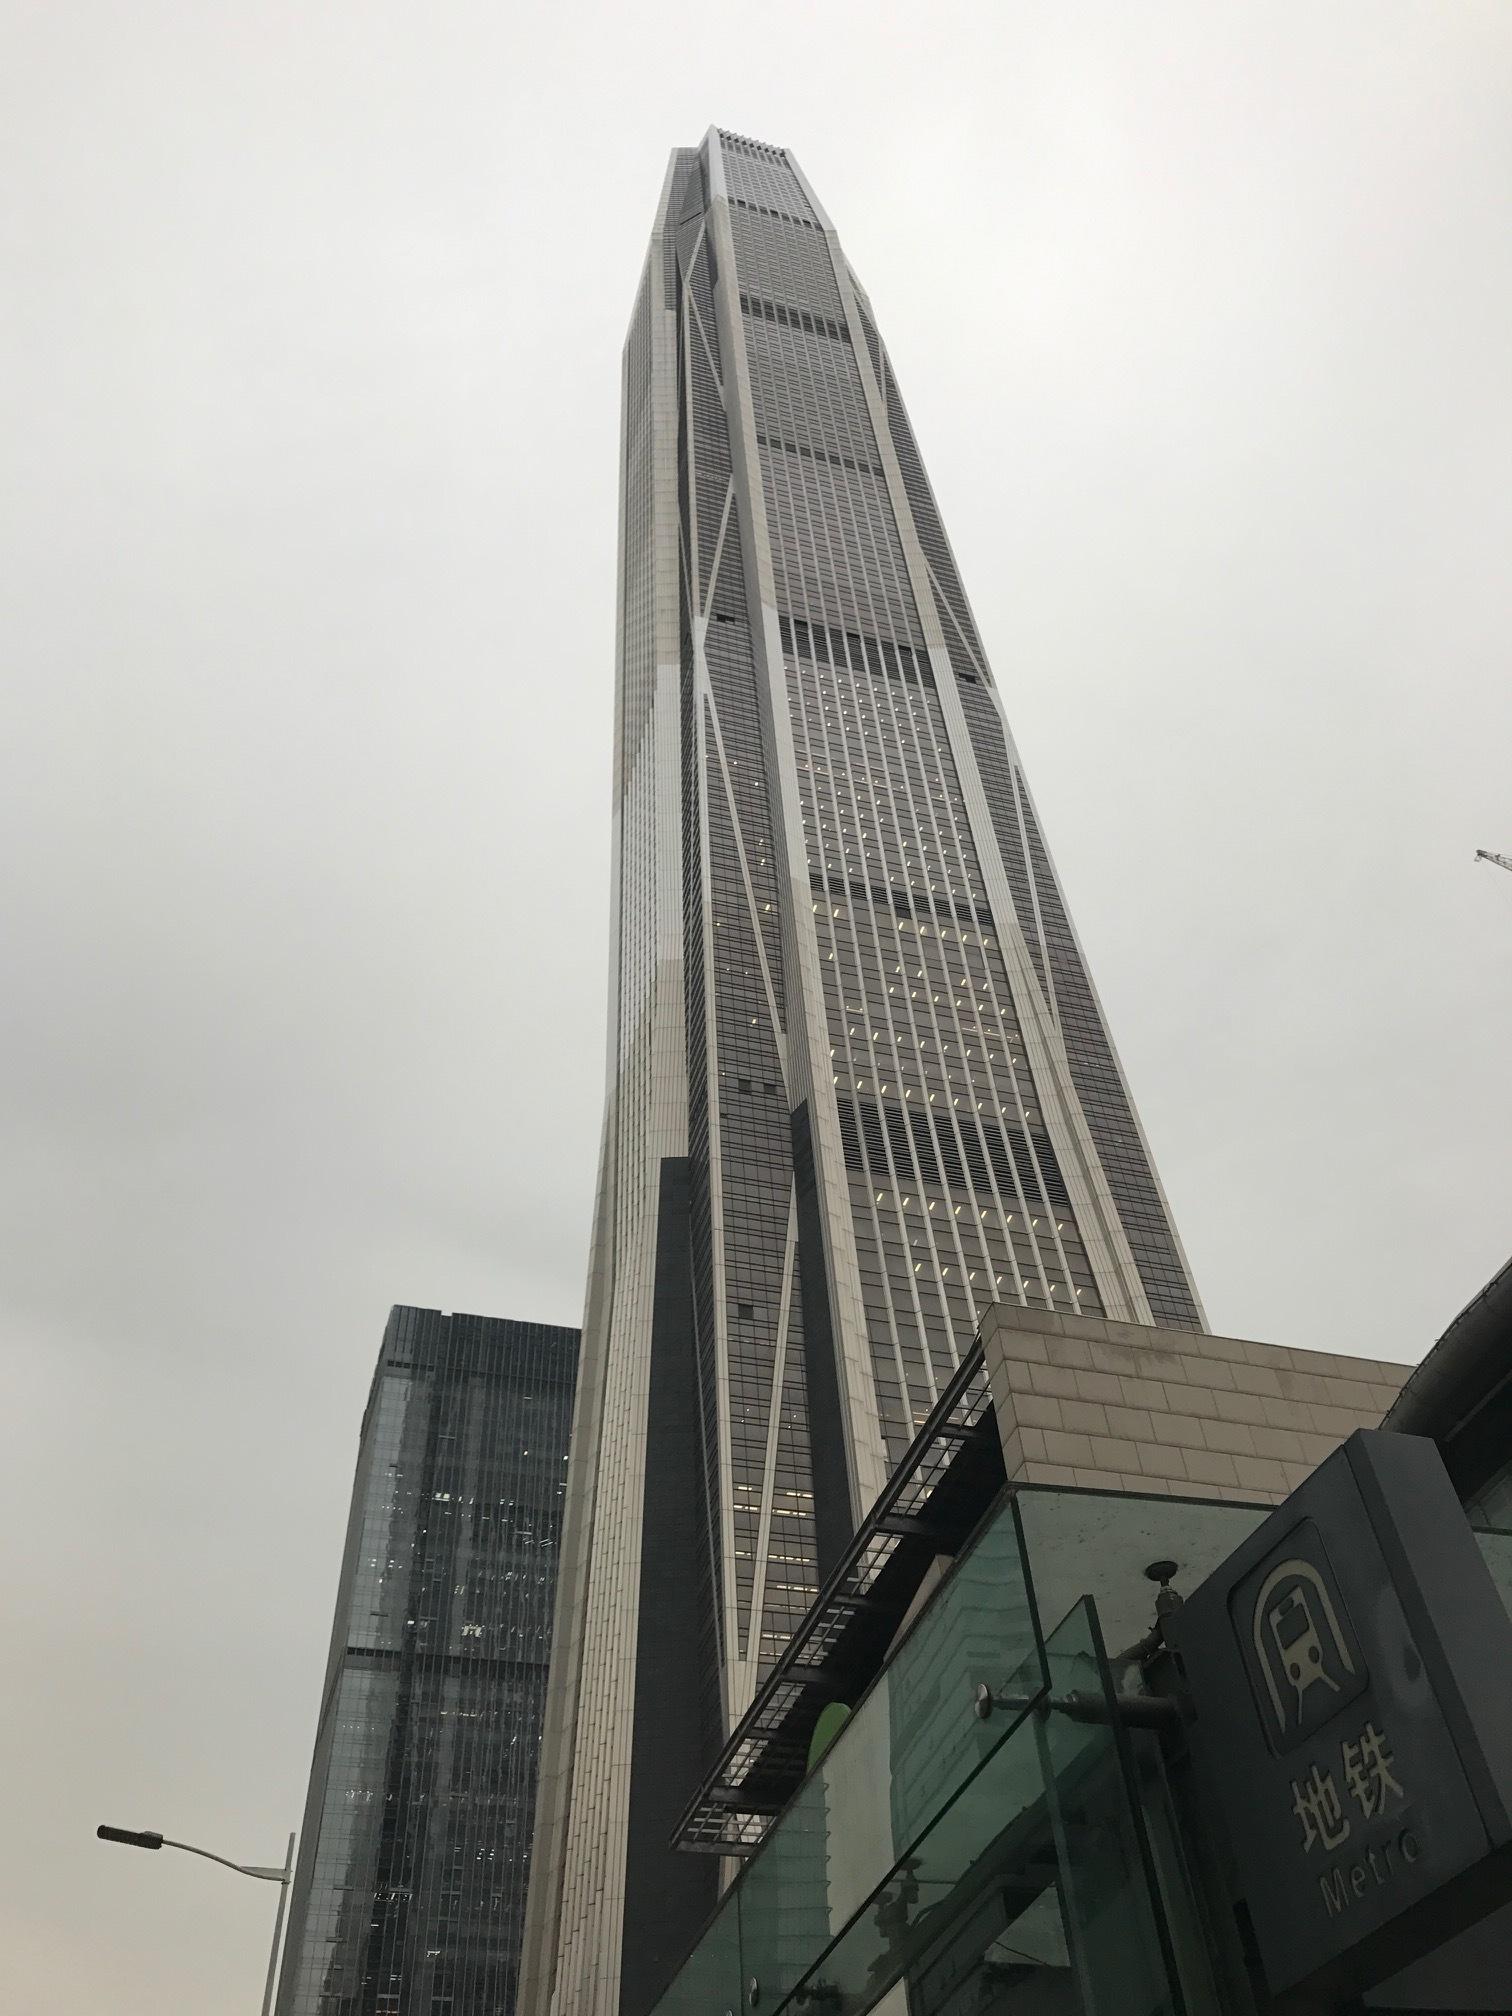 140 stories